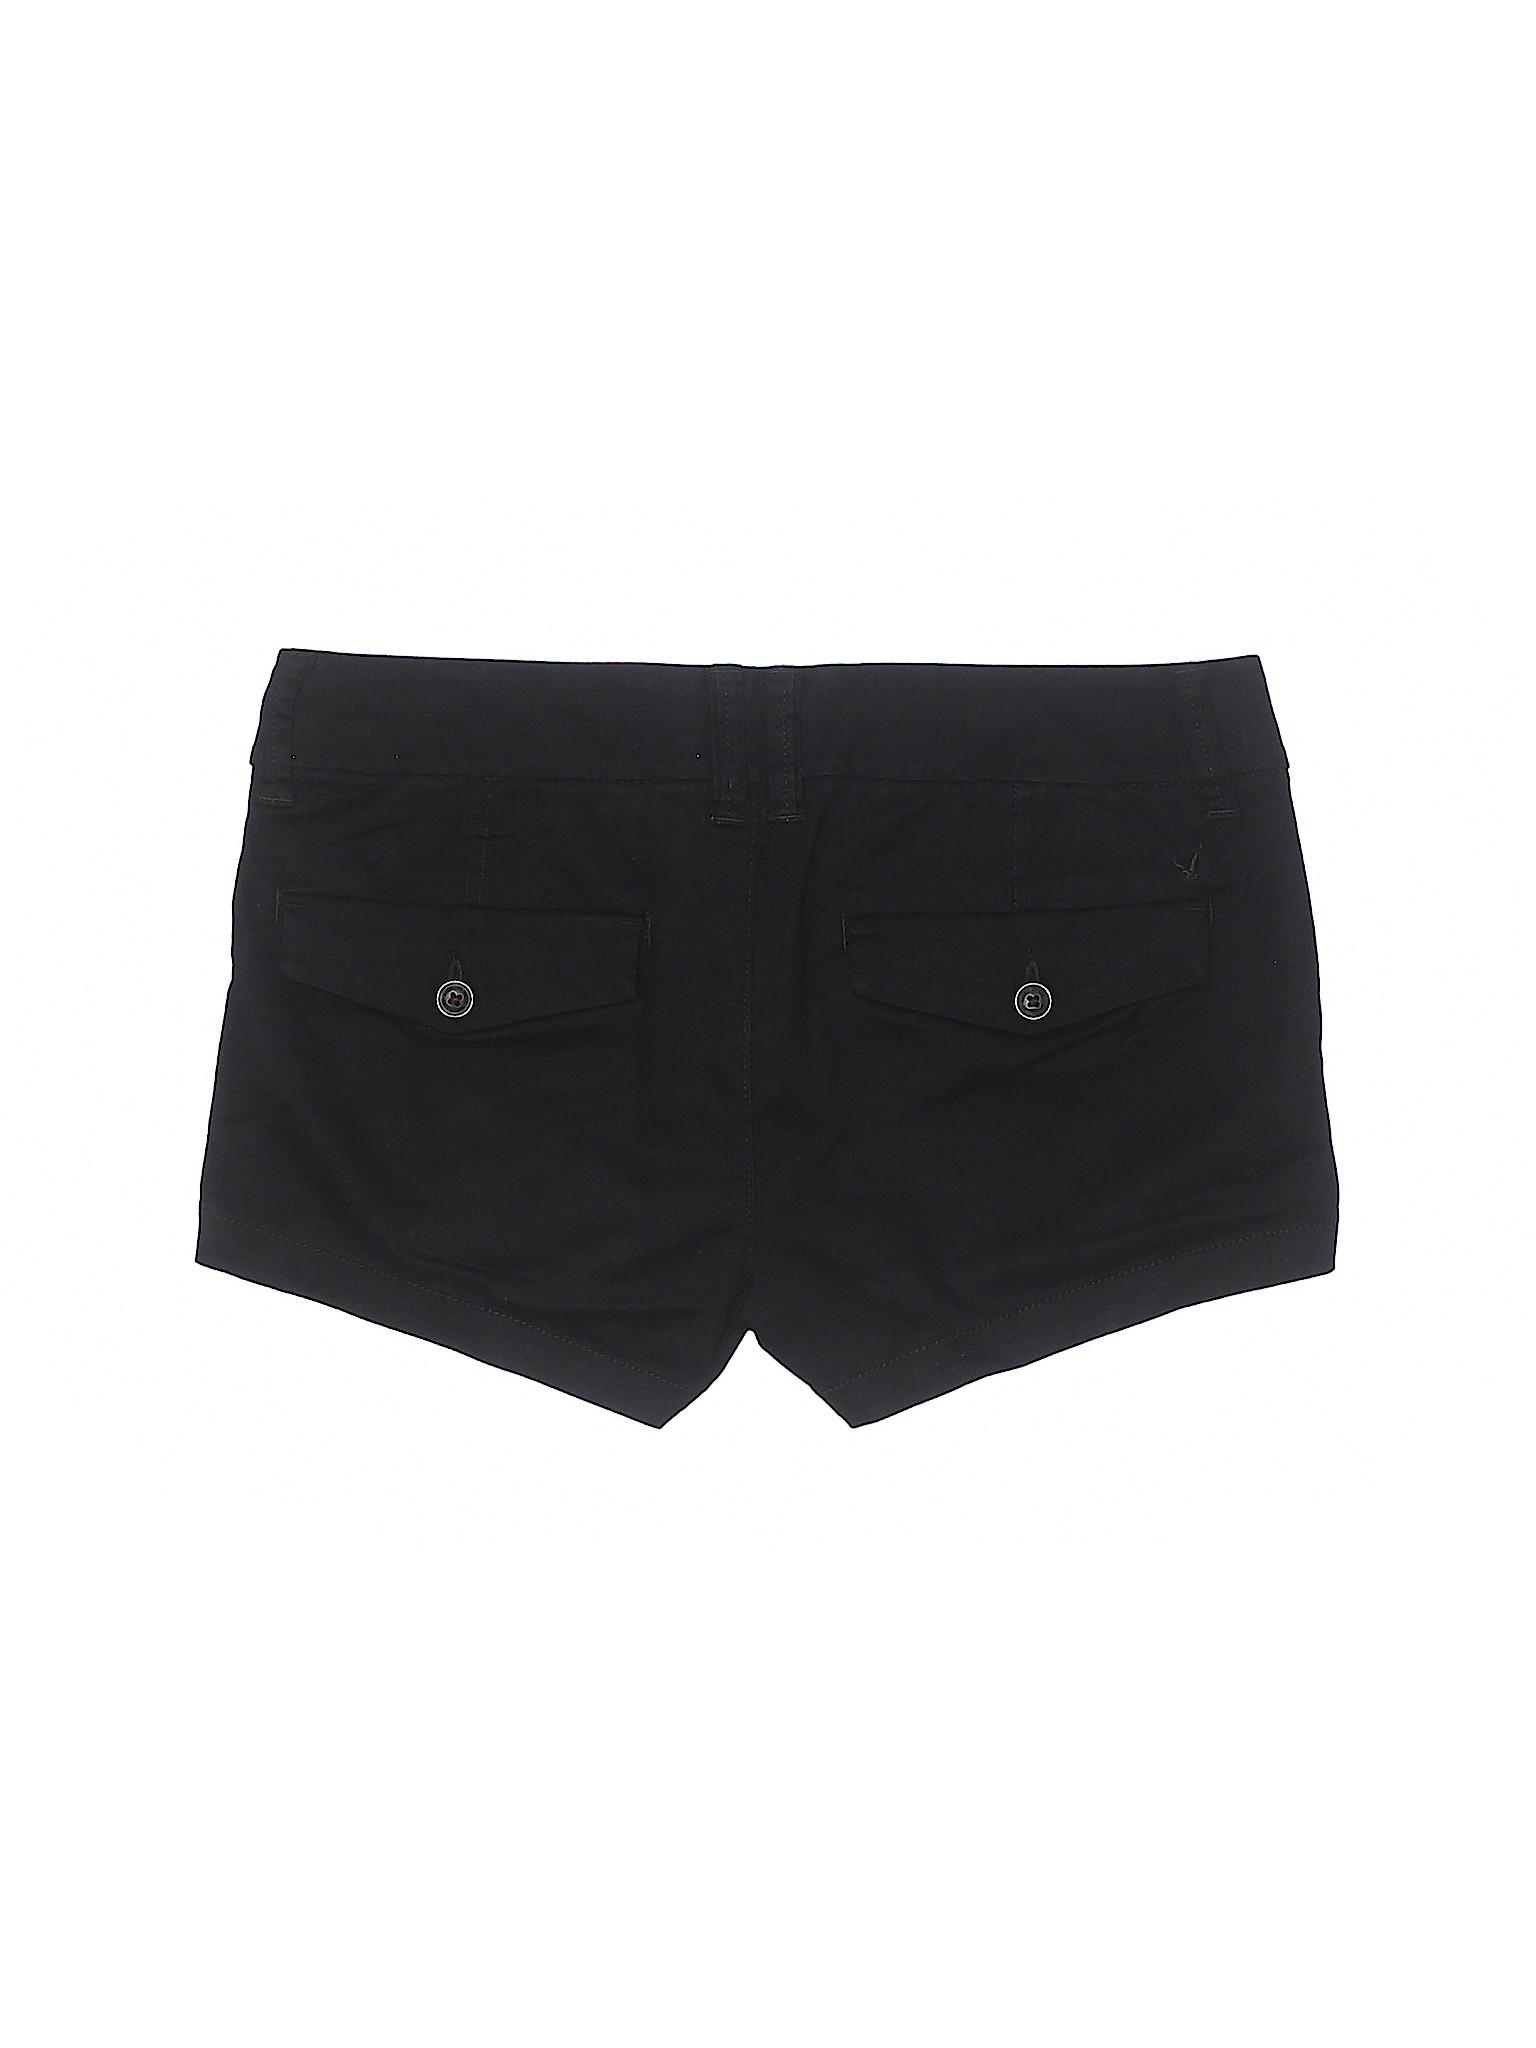 Boutique American Outfitters Khaki Eagle Shorts qaqPF